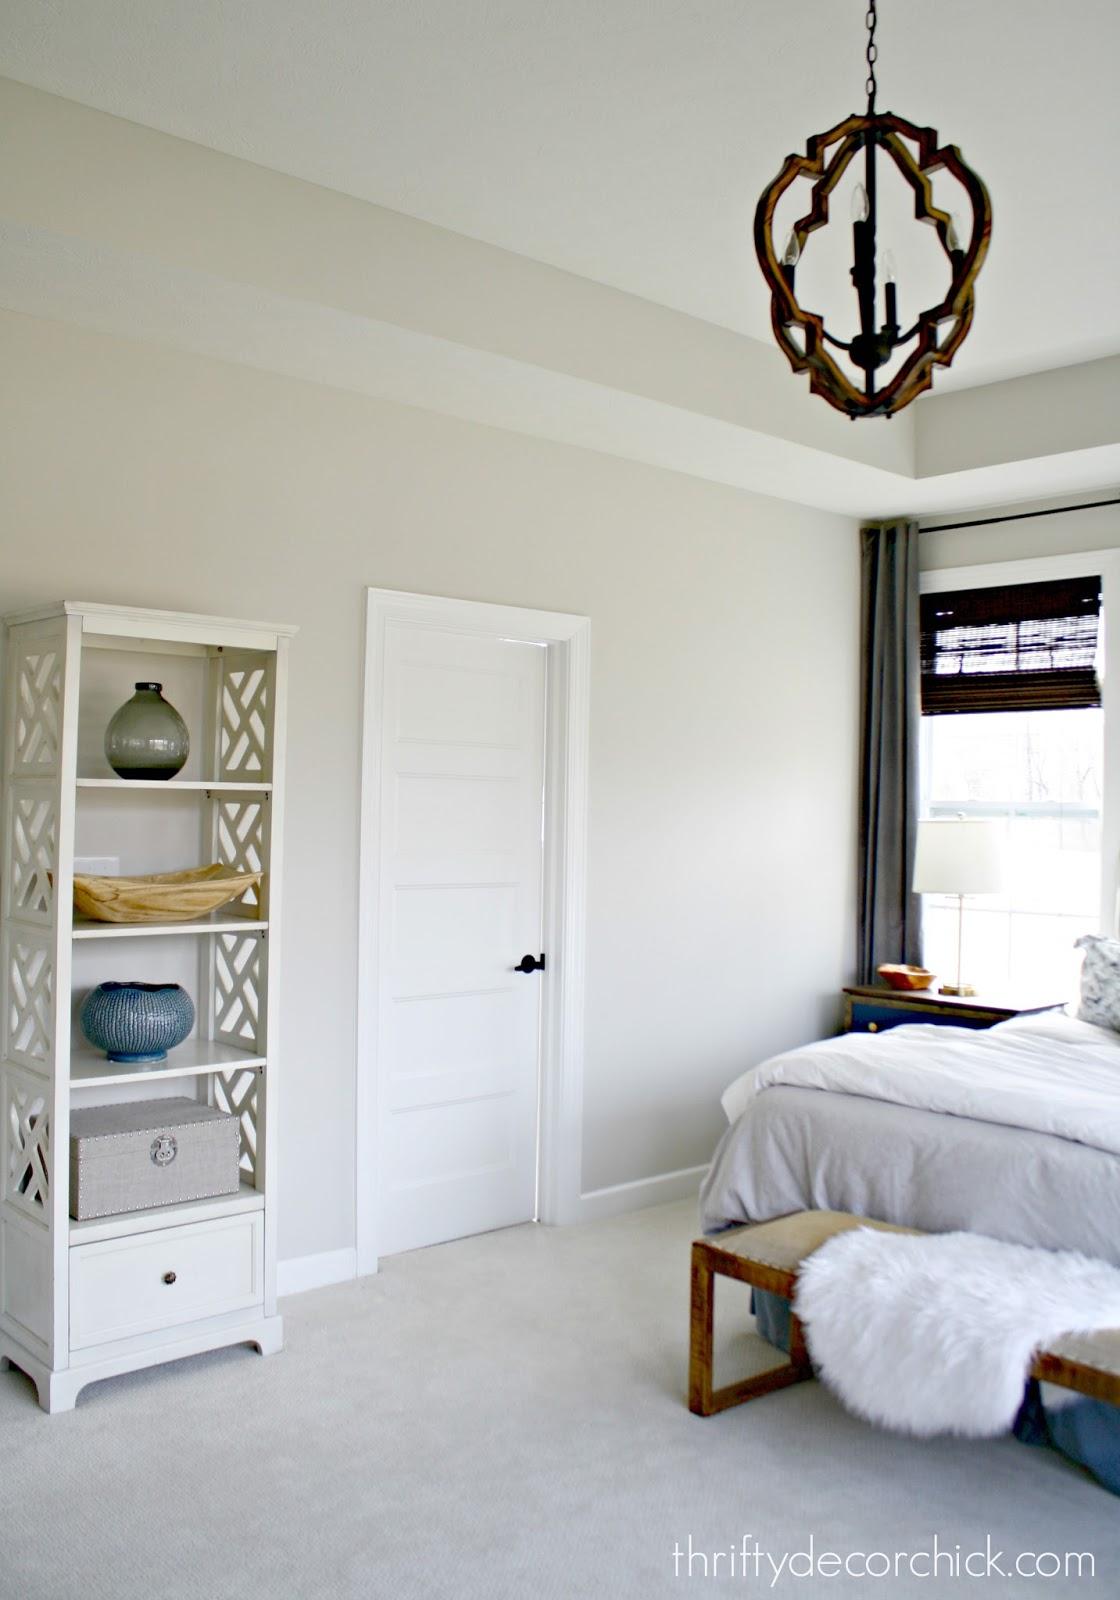 Five paneled white doors